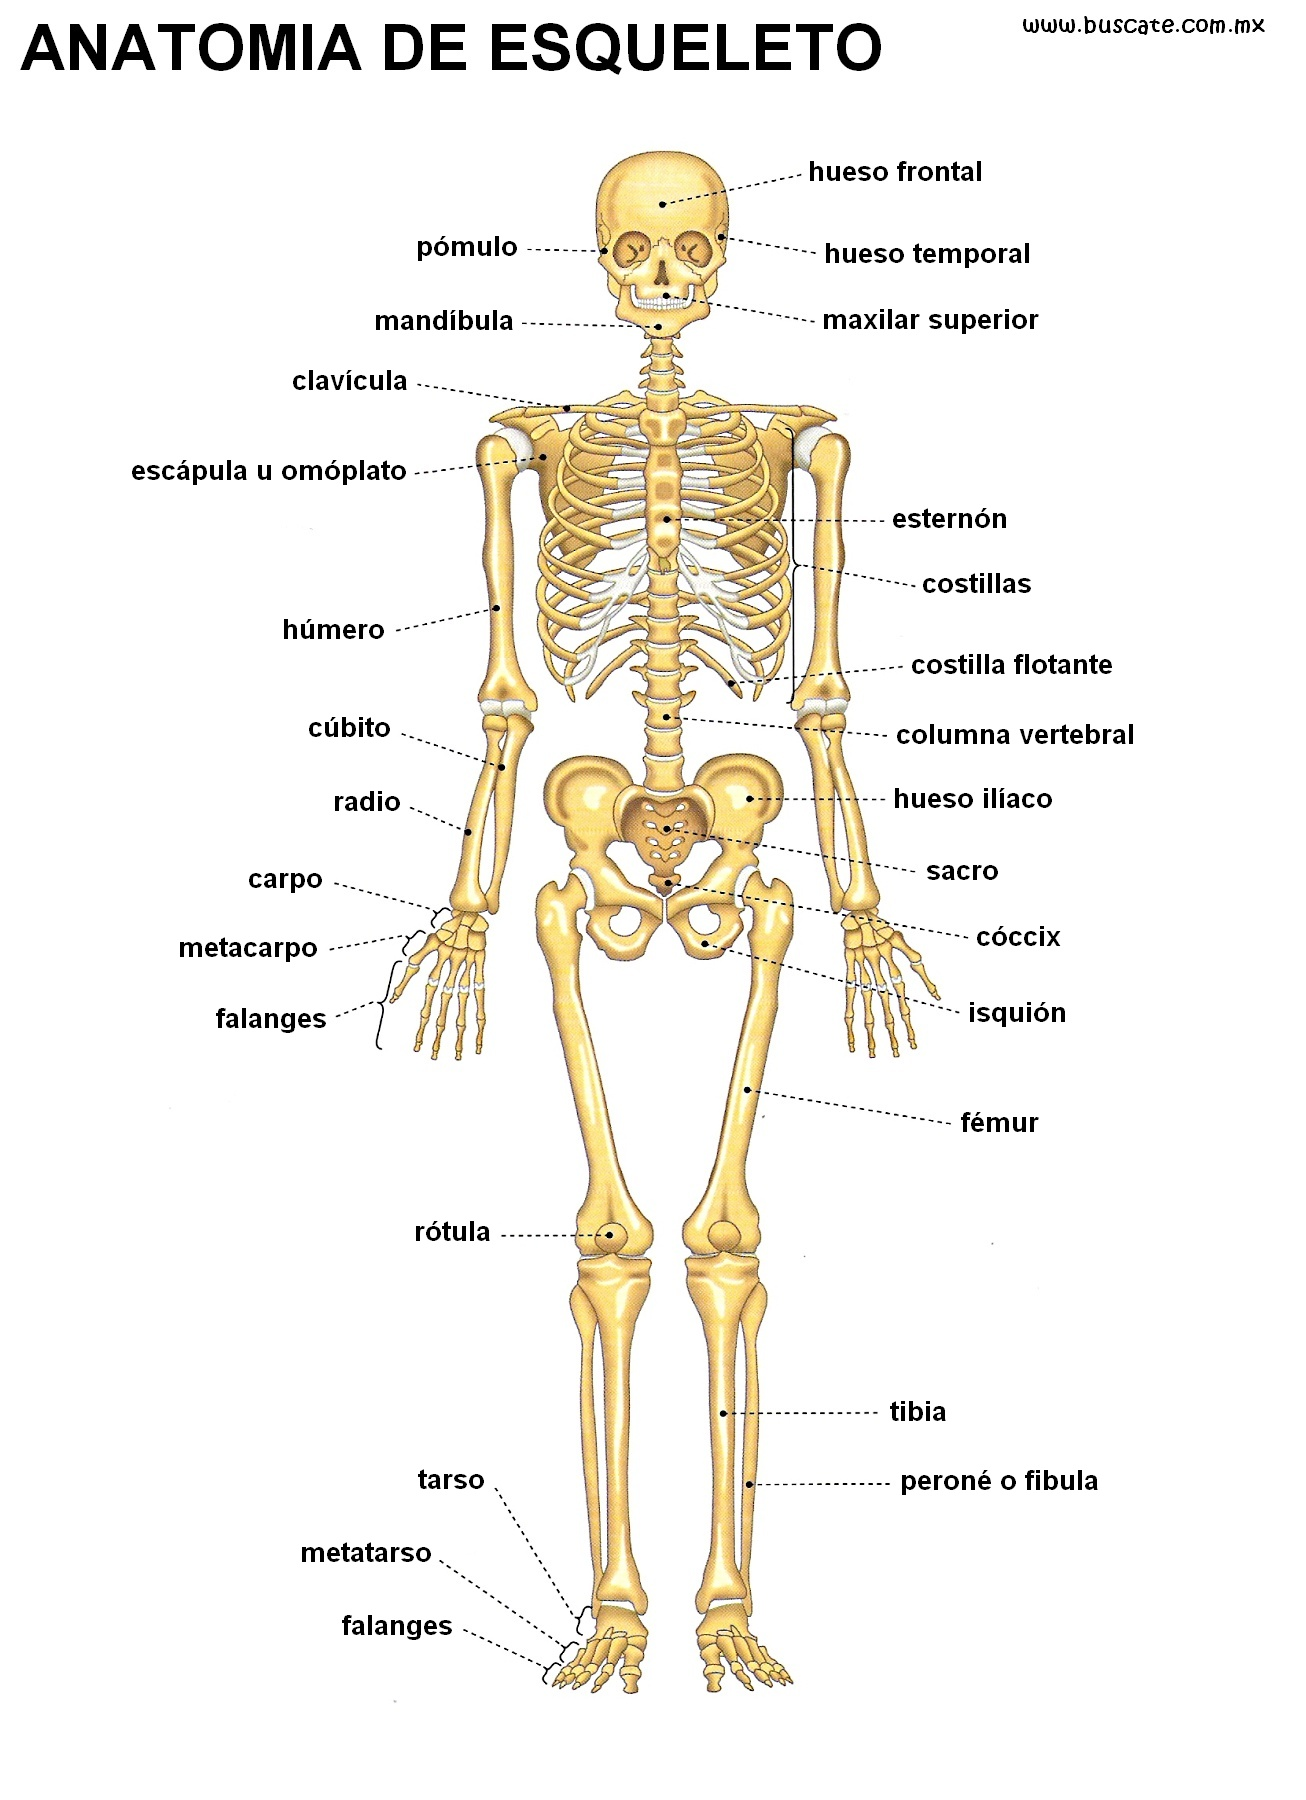 esquemas-anatomia-esqueleto-con-nombres-color-0001